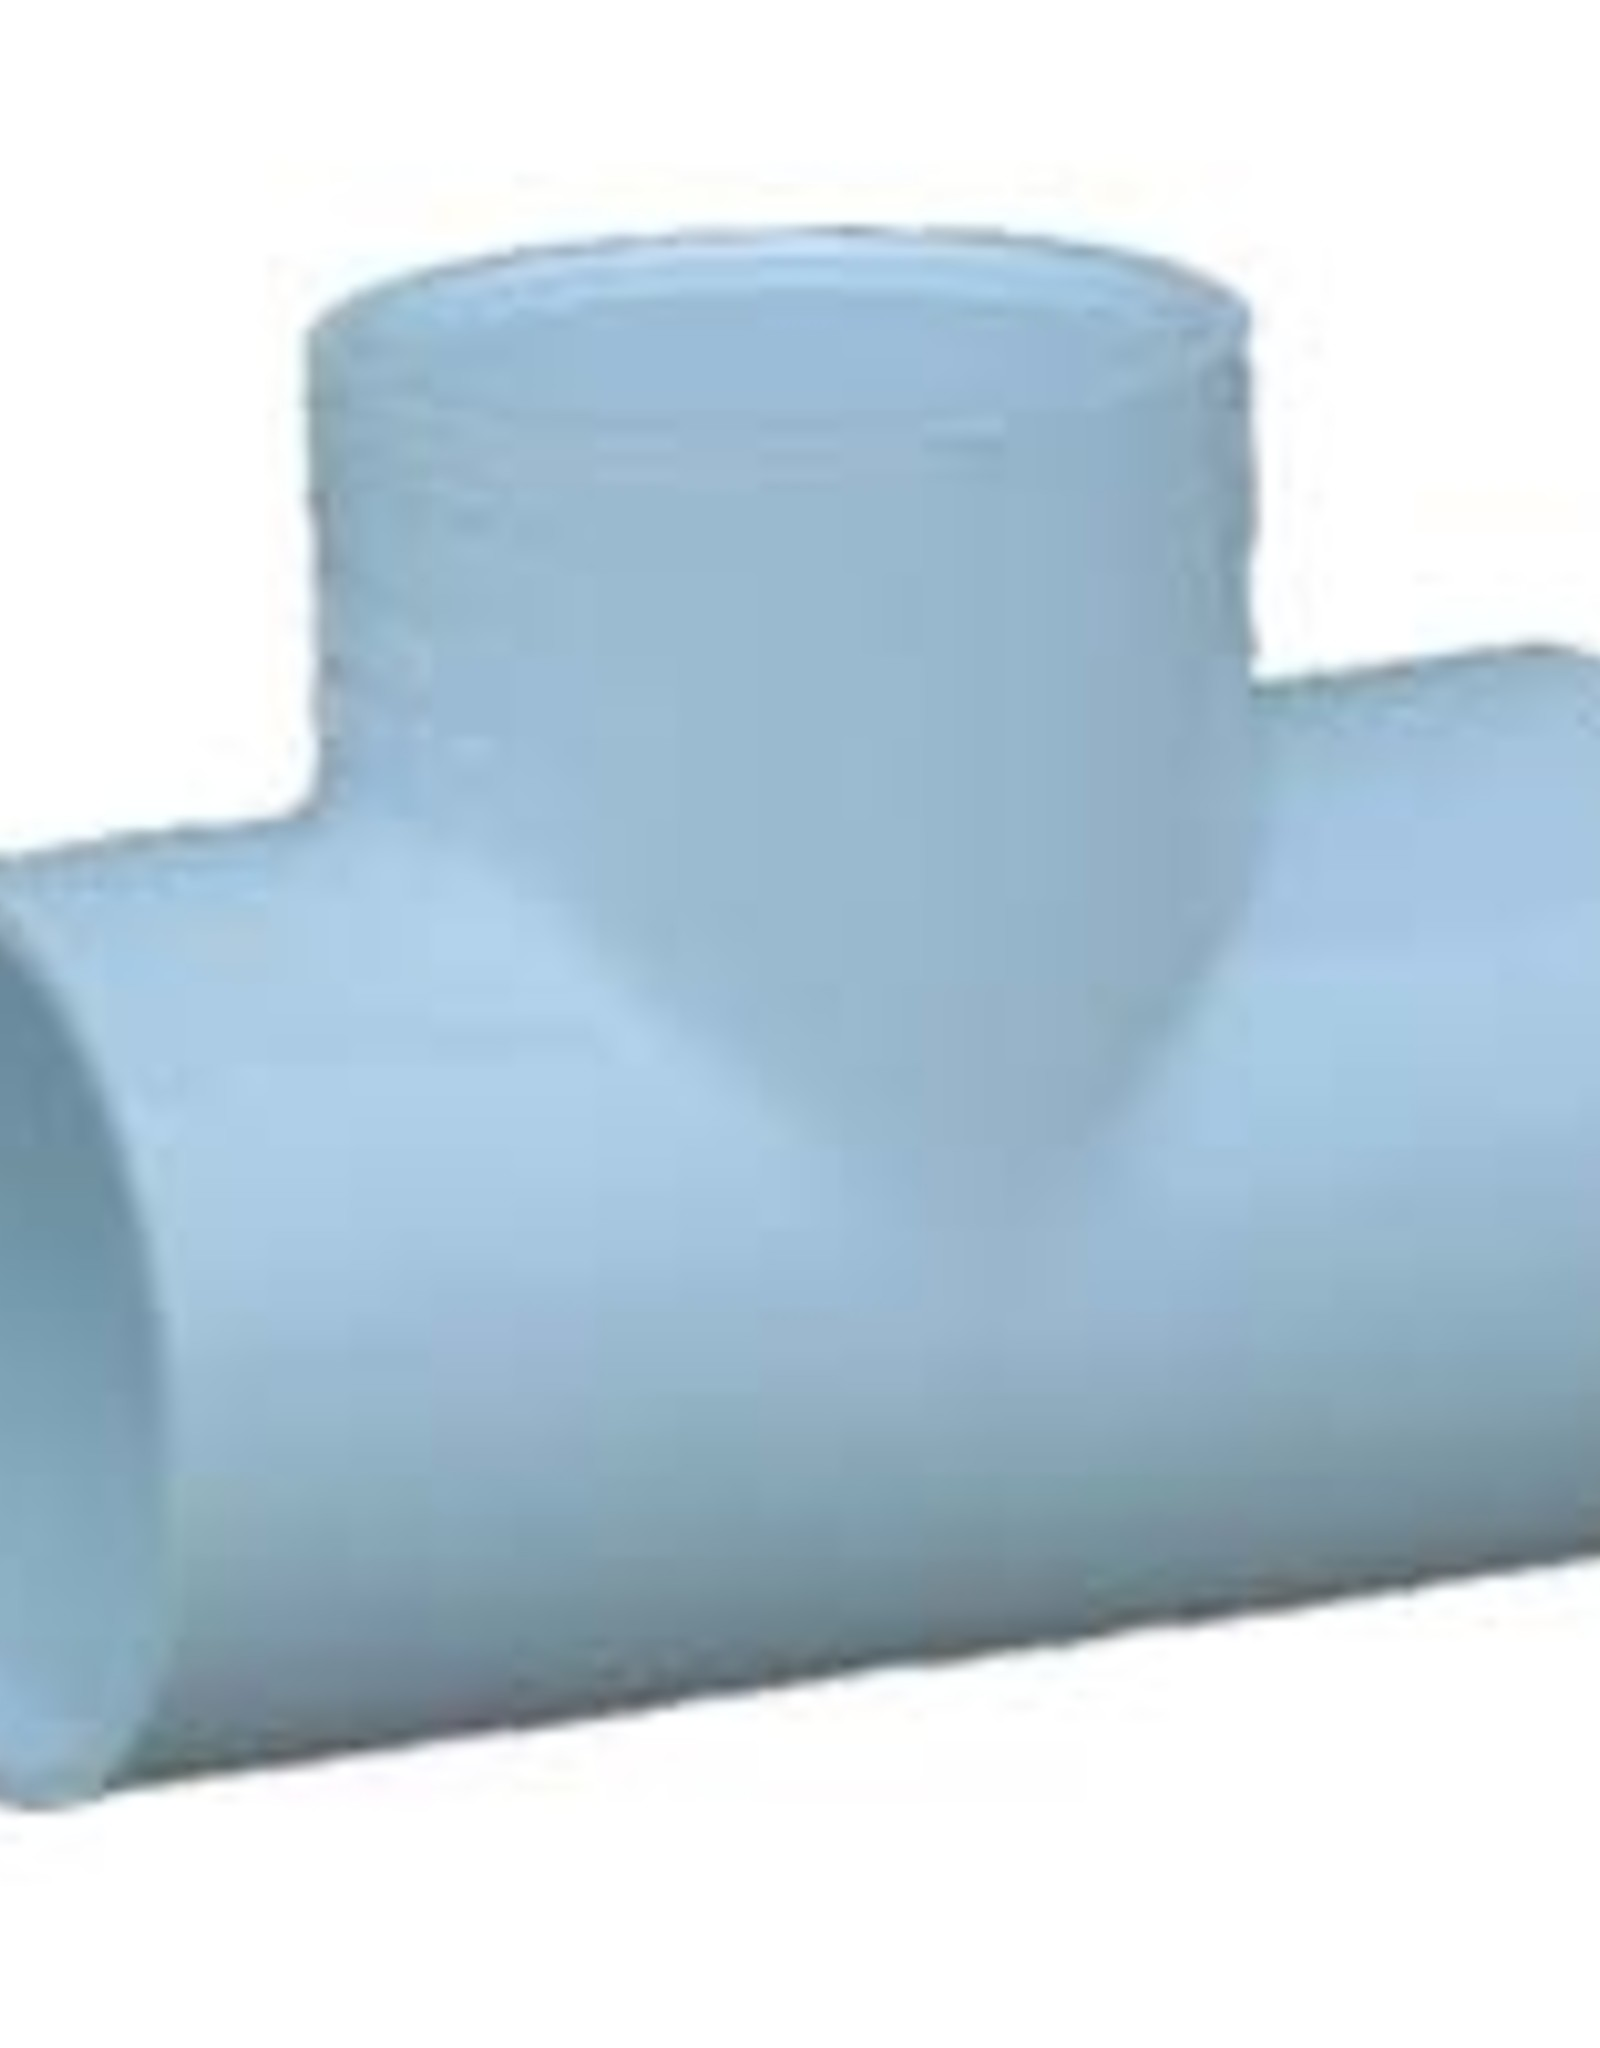 "Charlotte Pipe & Foundry PVC 1.5"" Tee Slip X Slip X Slip SCH 40"